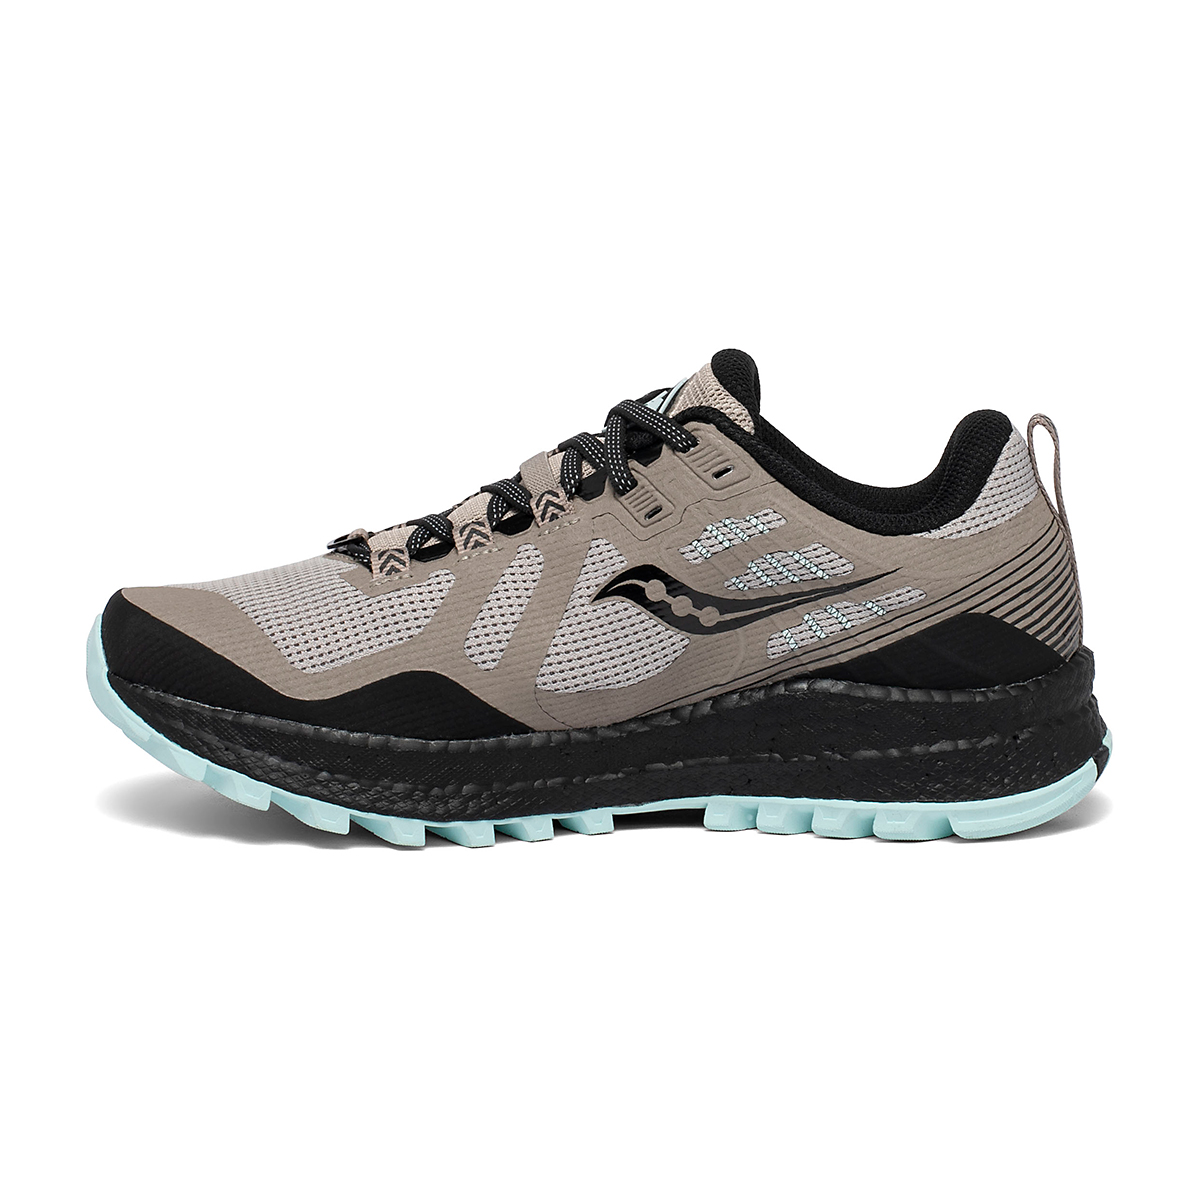 Women's Saucony Xodus 10 Trail Running Shoe - Color: Moonrock/Black - Size: 5 - Width: Regular, Moonrock/Black, large, image 2